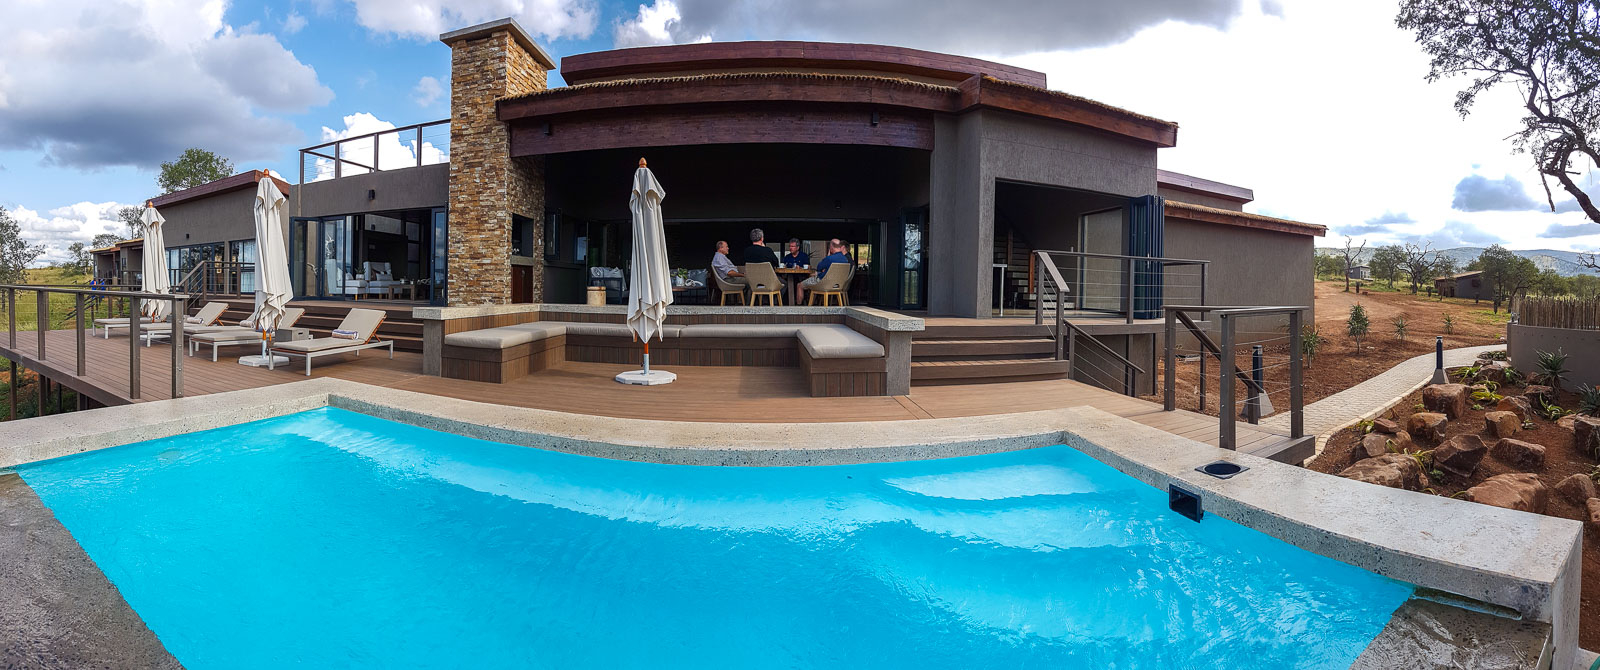 Pool och lodge